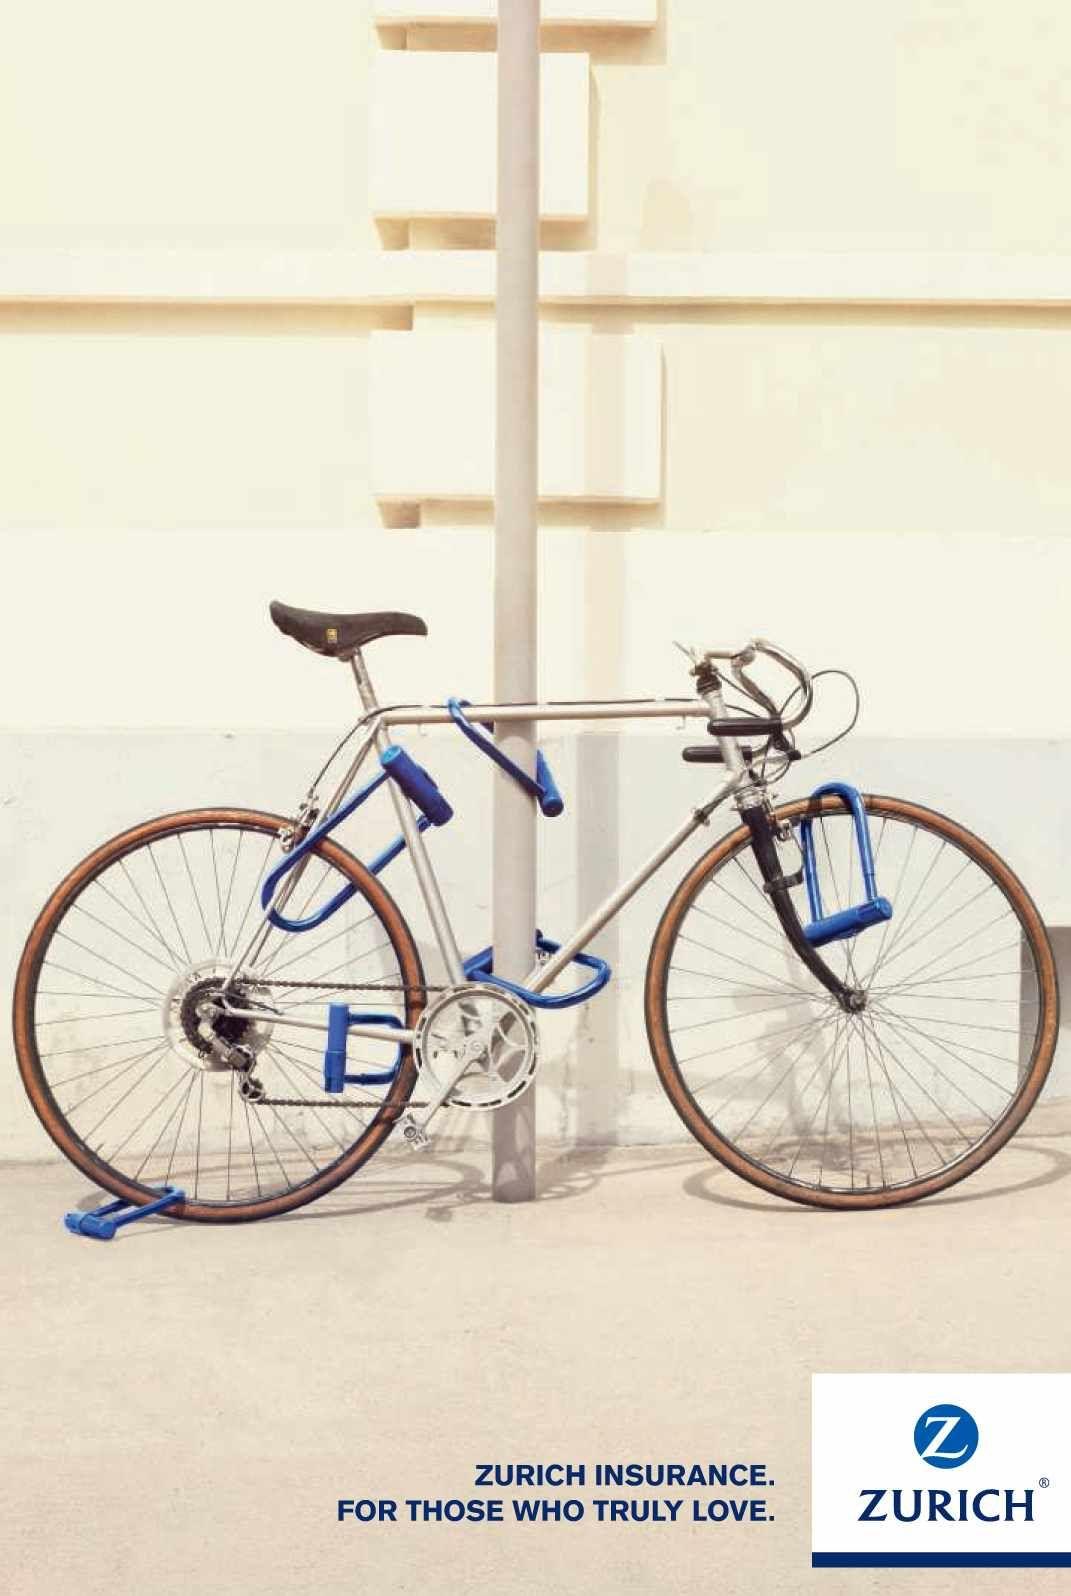 Zurich Insurance Company: Bike | BIKE Adds | Pinterest ...